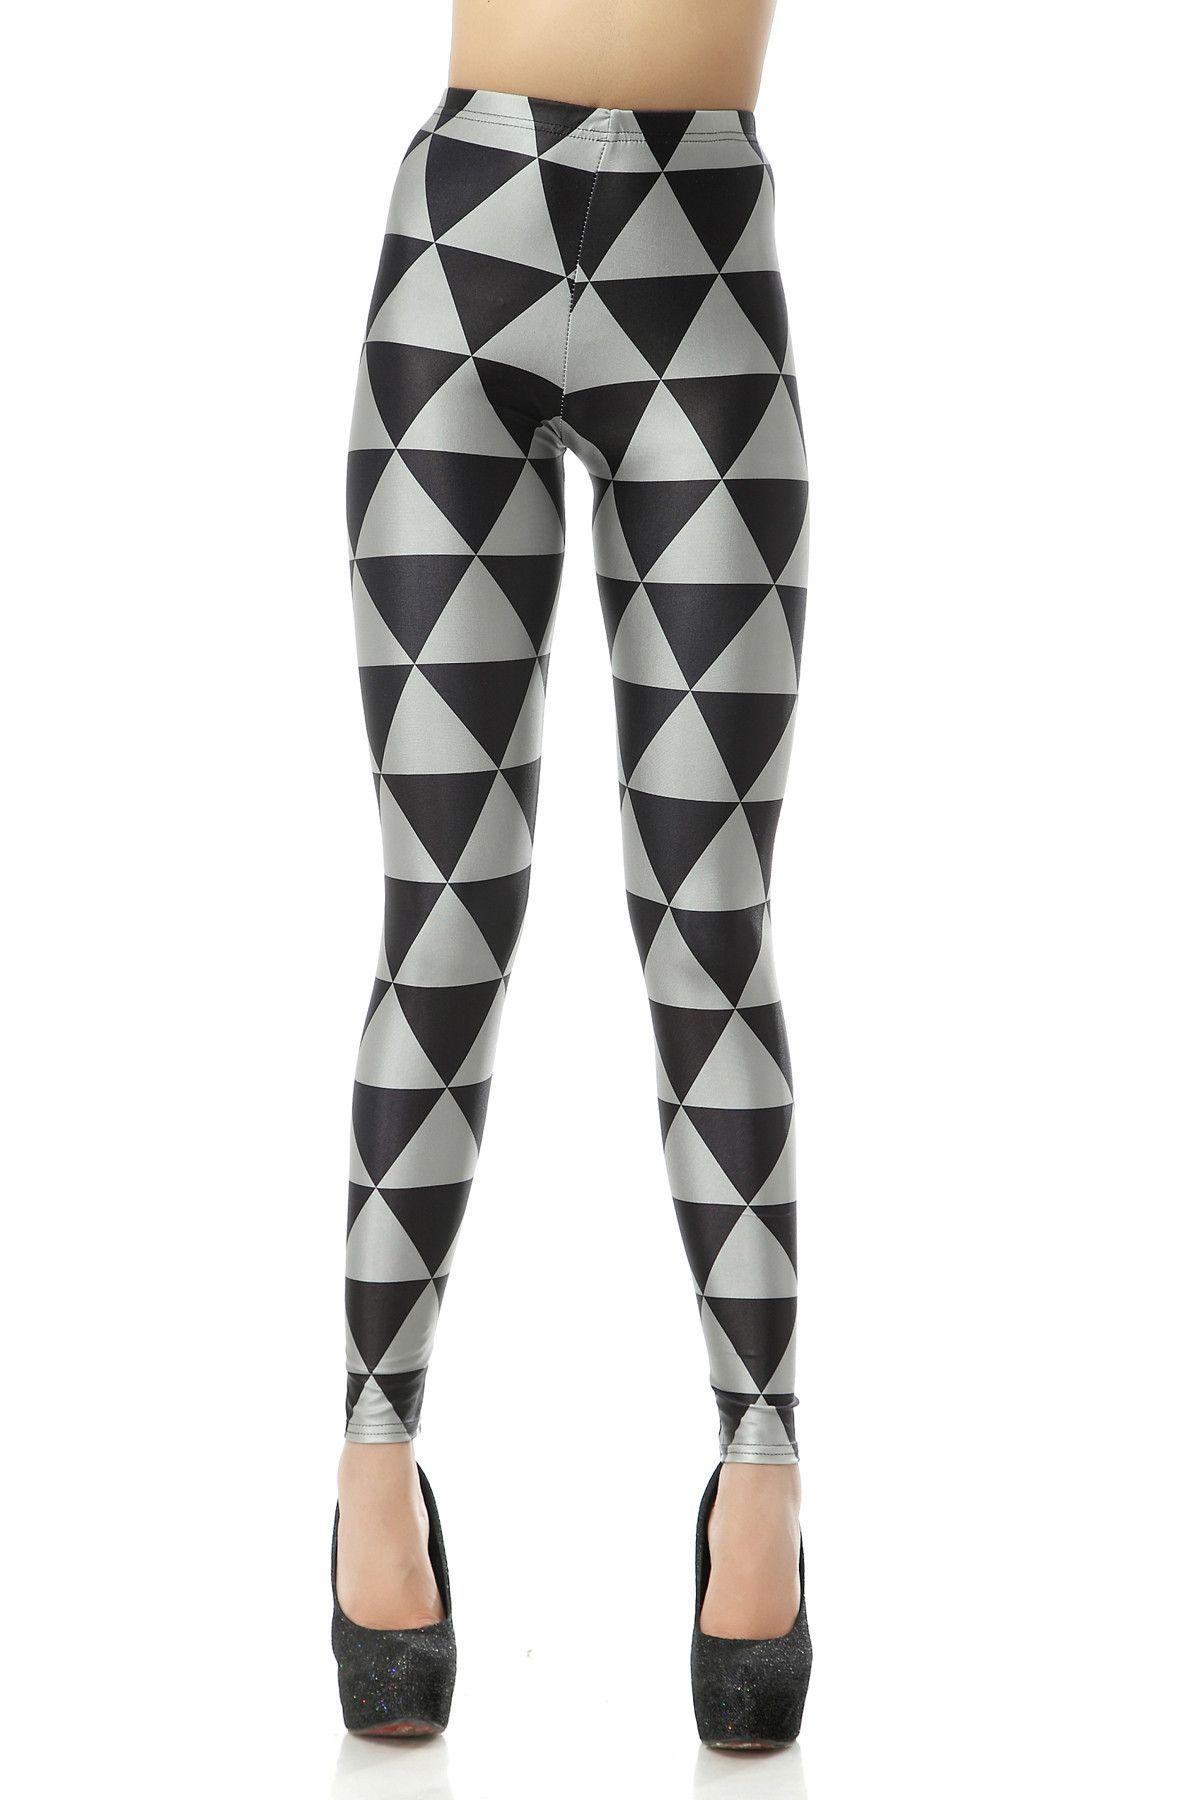 Majestic triangle Leggings